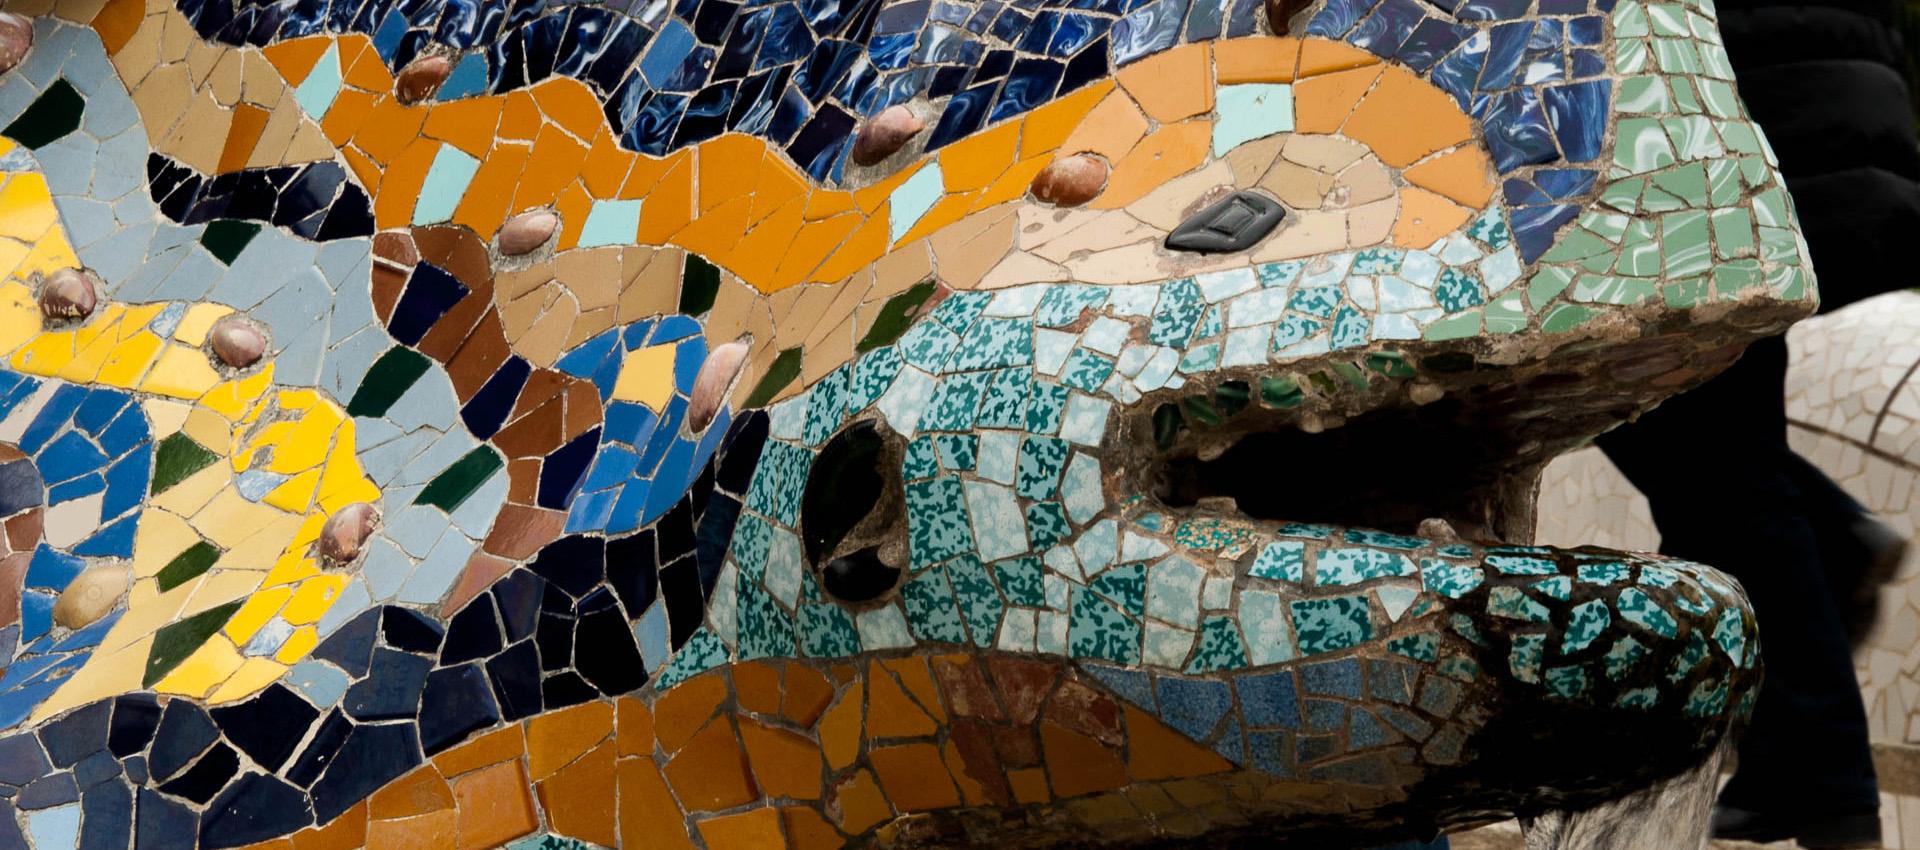 Dragon, Guell Park, Barcelona